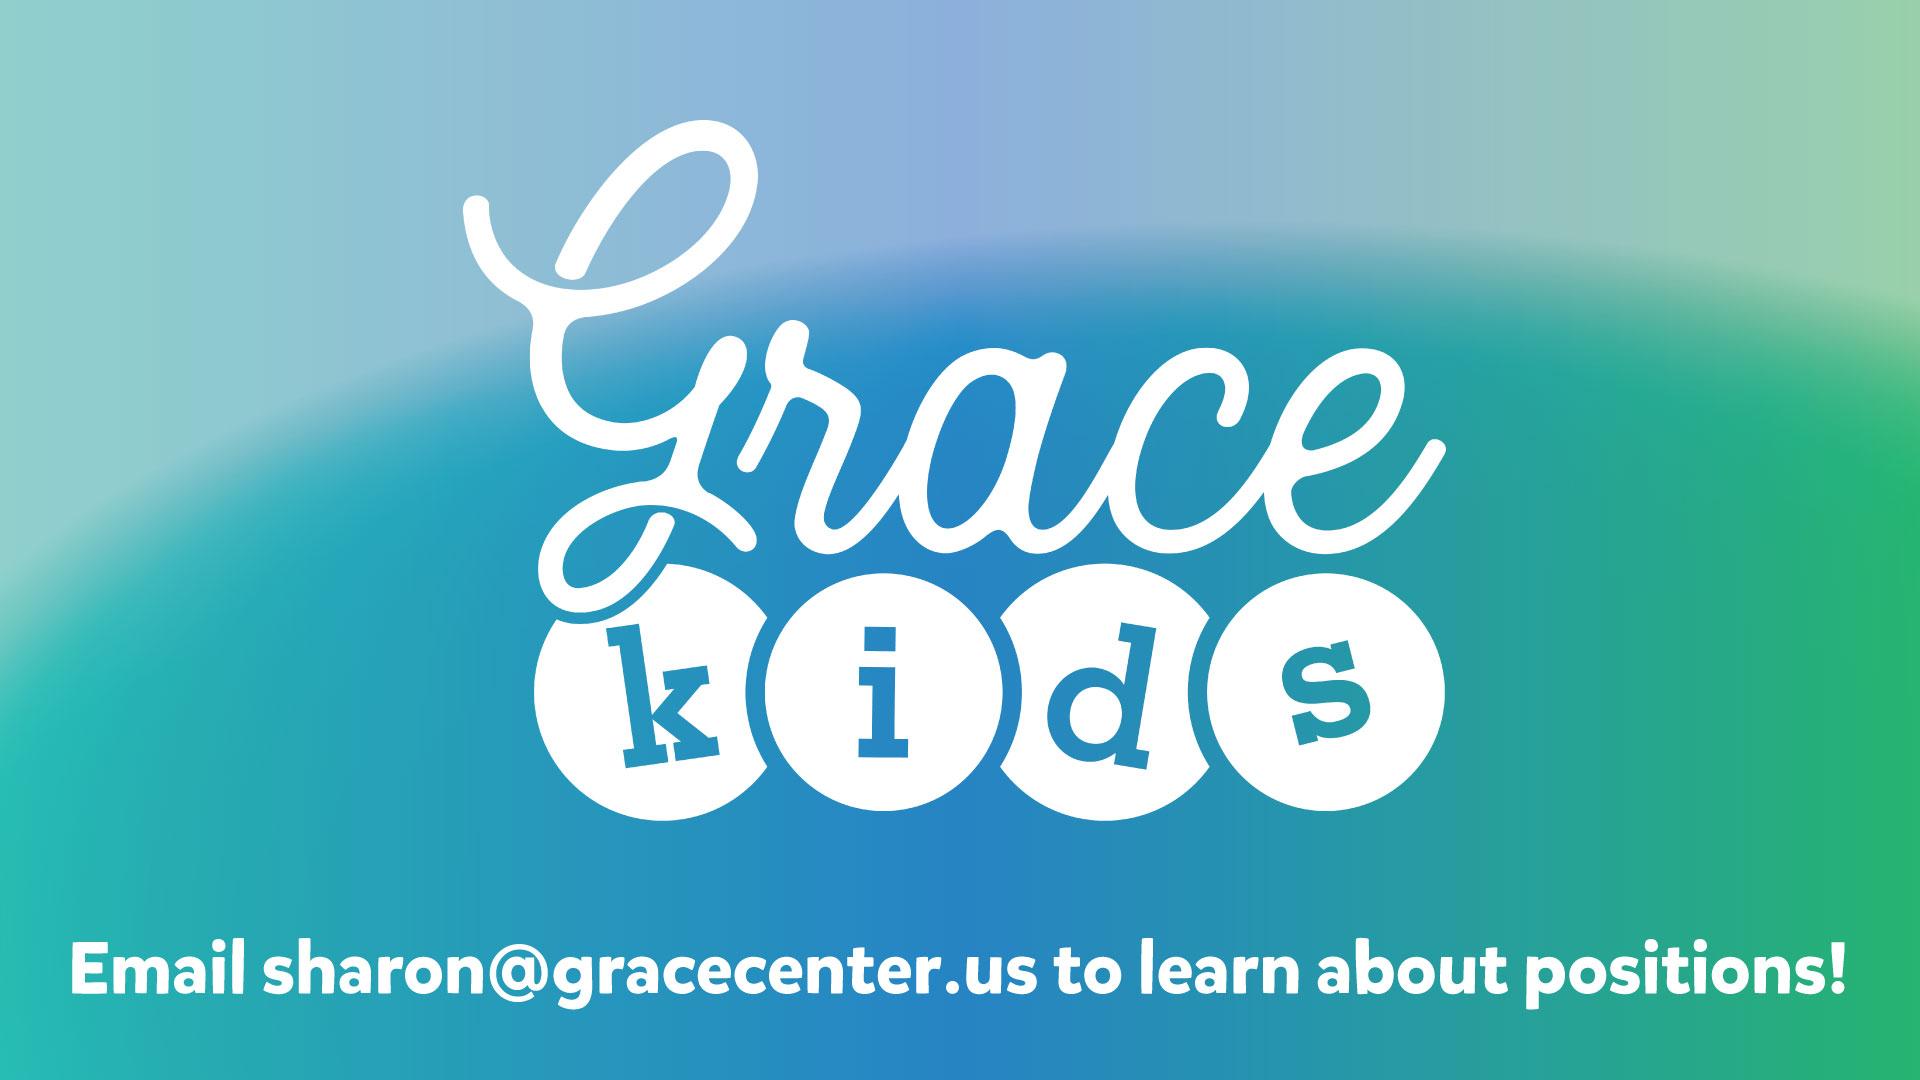 GRACE-KIDS-Positions.jpg